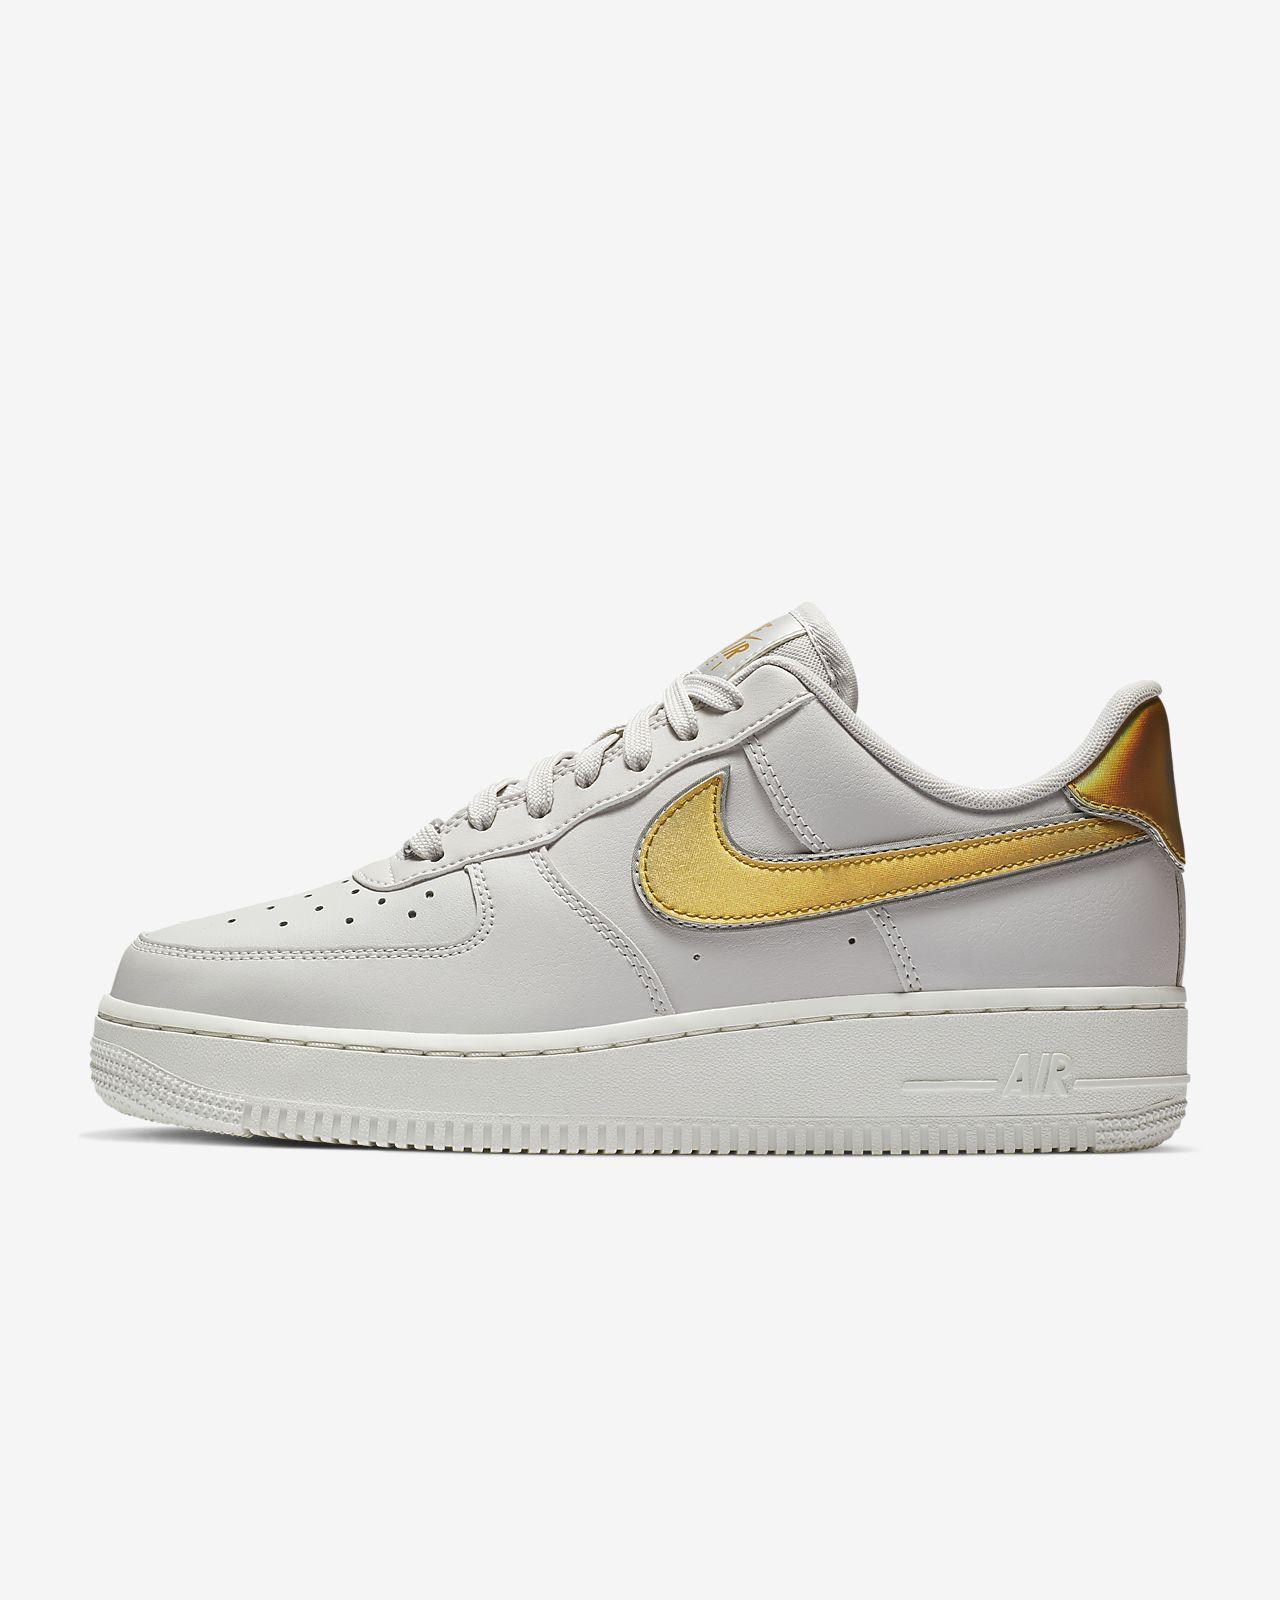 quality design af902 ed410 ... Buty damskie Nike Air Force 1 07 Metallic